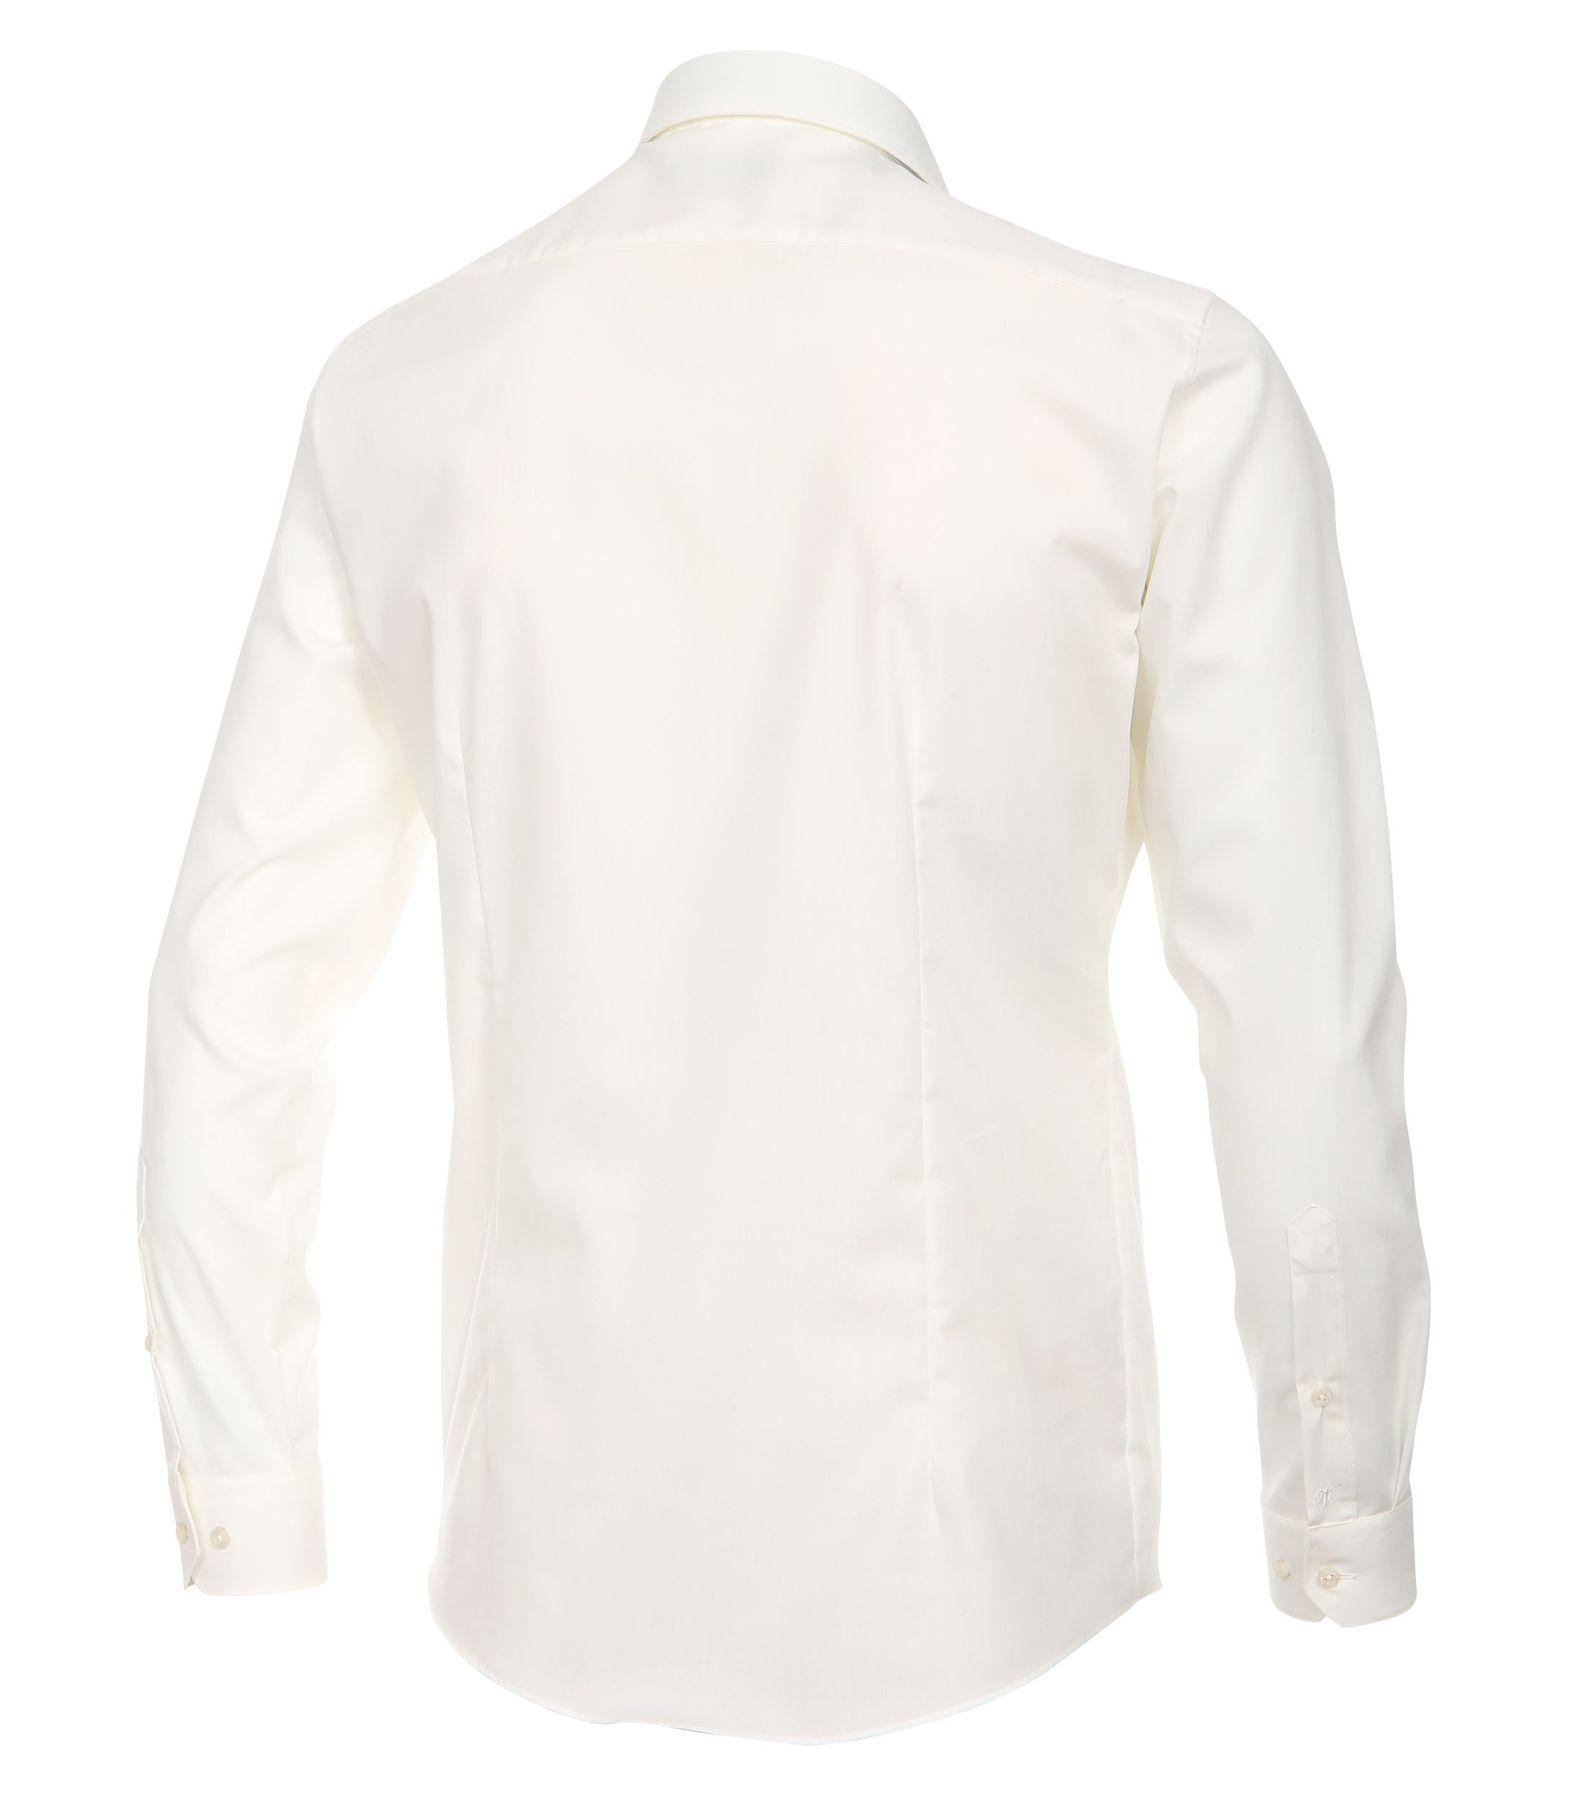 Venti - Body Fit/Super Slim Fit - Bügelfreies Herren Langarm Hemd in diversen Farben (001470) – Bild 7